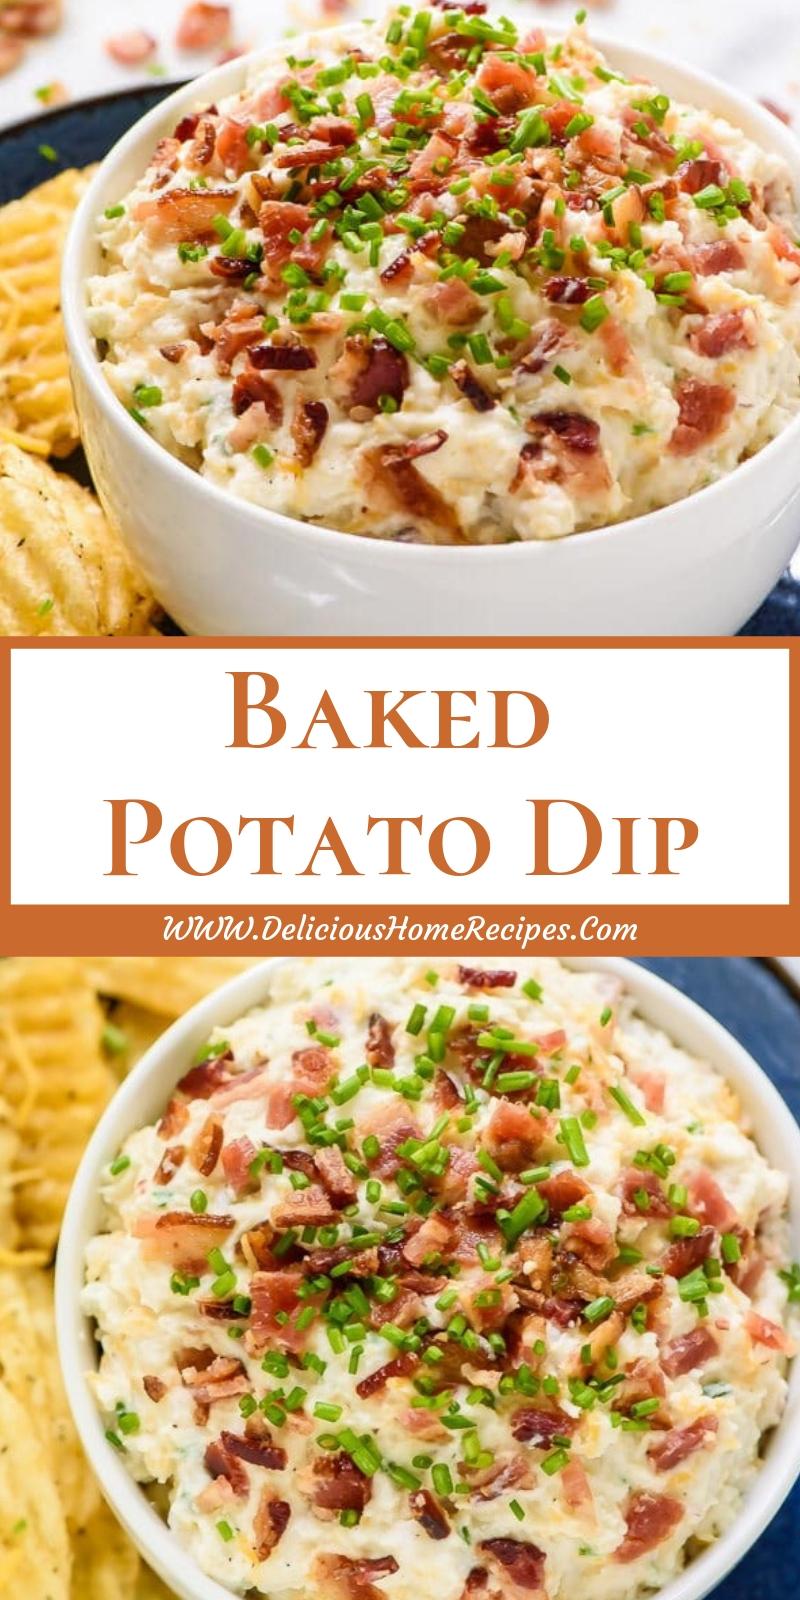 Baked Potato Dip